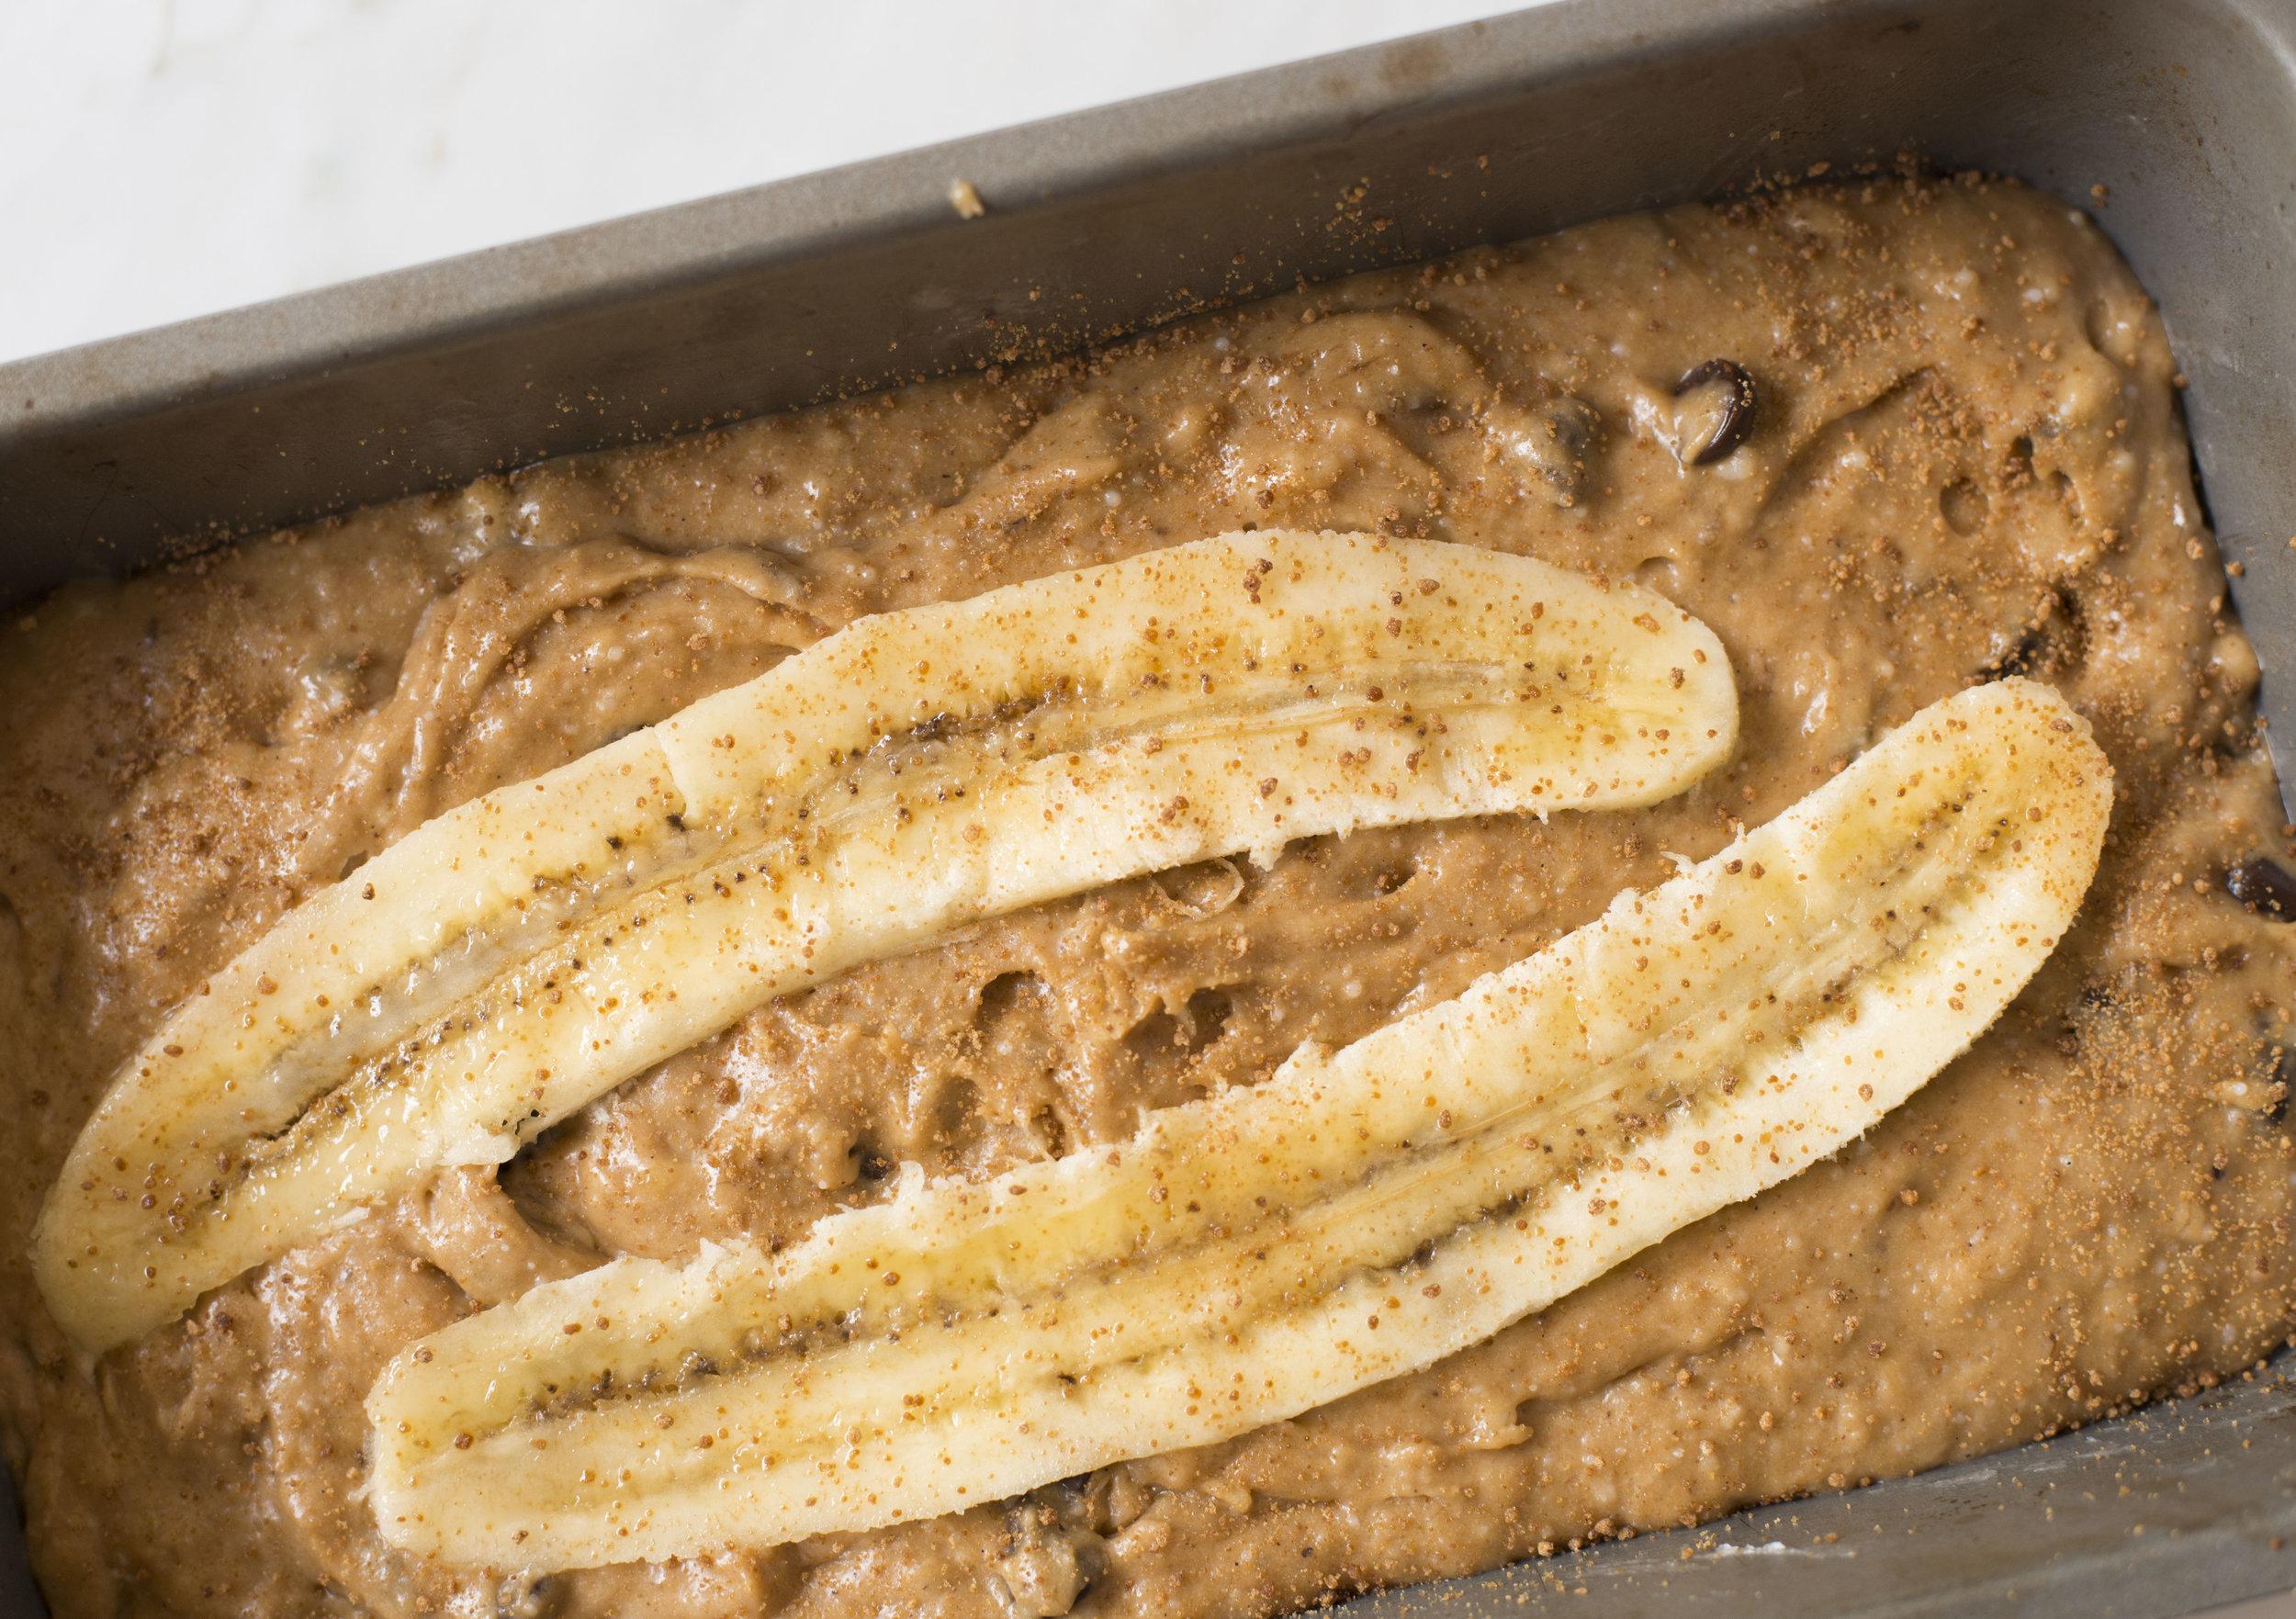 mixed-and-measured-healthy-chocolate-chip-banana-bread-recipe3.jpg